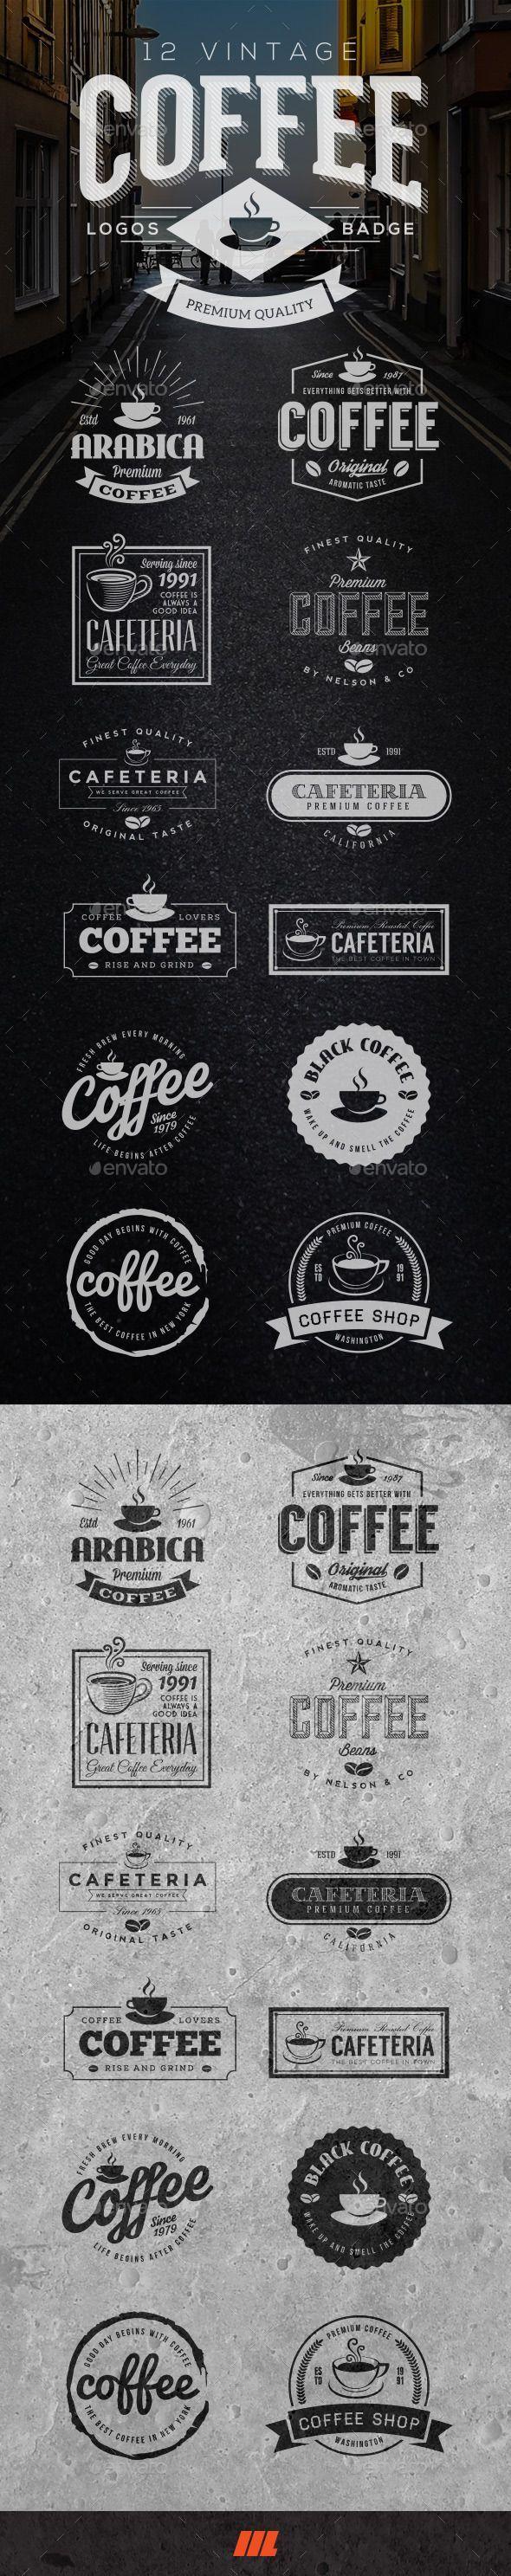 12 Retro Vintage Coffee Logo - Badges & Stickers Web Elements